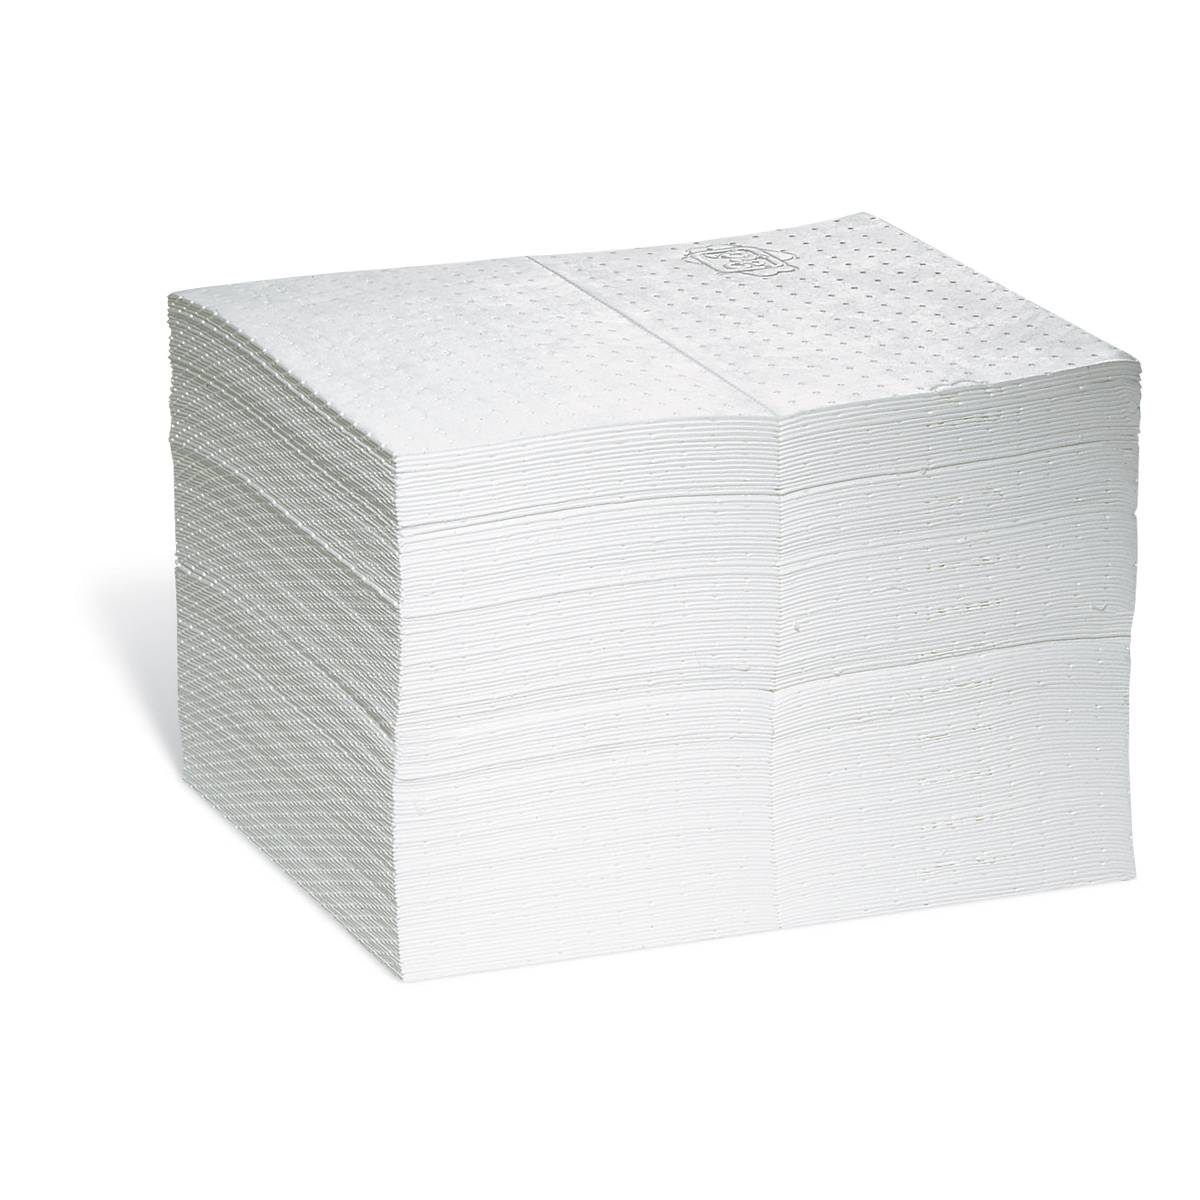 Axess Industries Feuille et rouleau absorbants pour huiles - 8 couches   Absorption 76,2 L   C...